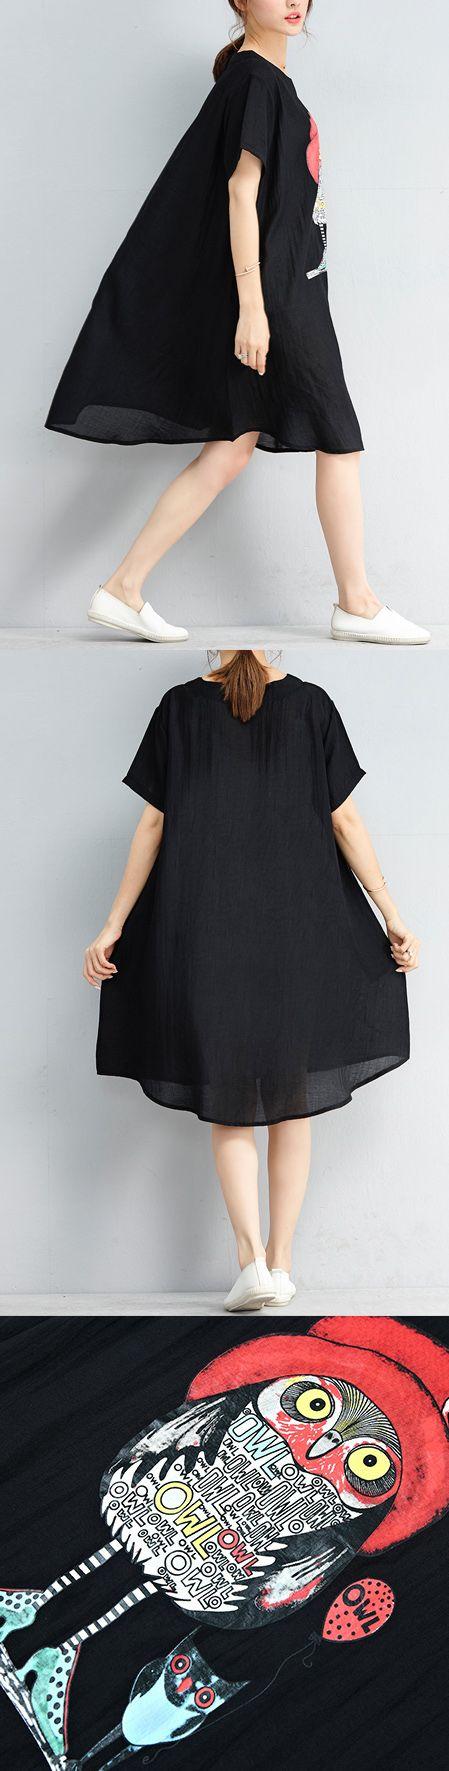 f3b6c06a01cc 2018 black chiffon shift dresses oversize shirt dress casual short sleeve  Cartoon print dress5